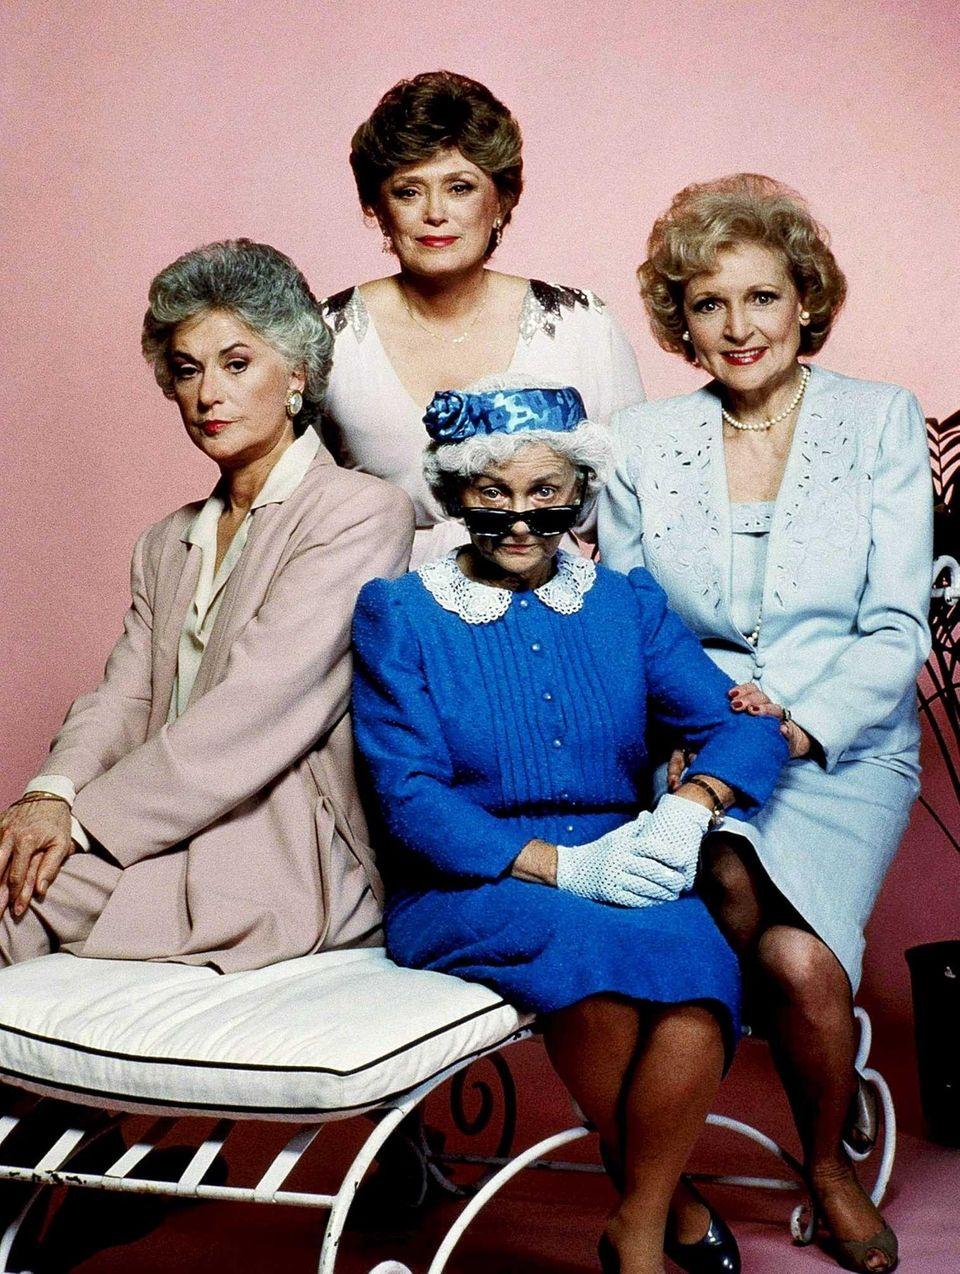 Four seniors (Bea Arthur, Estelle Getty, Rue McClanahan,